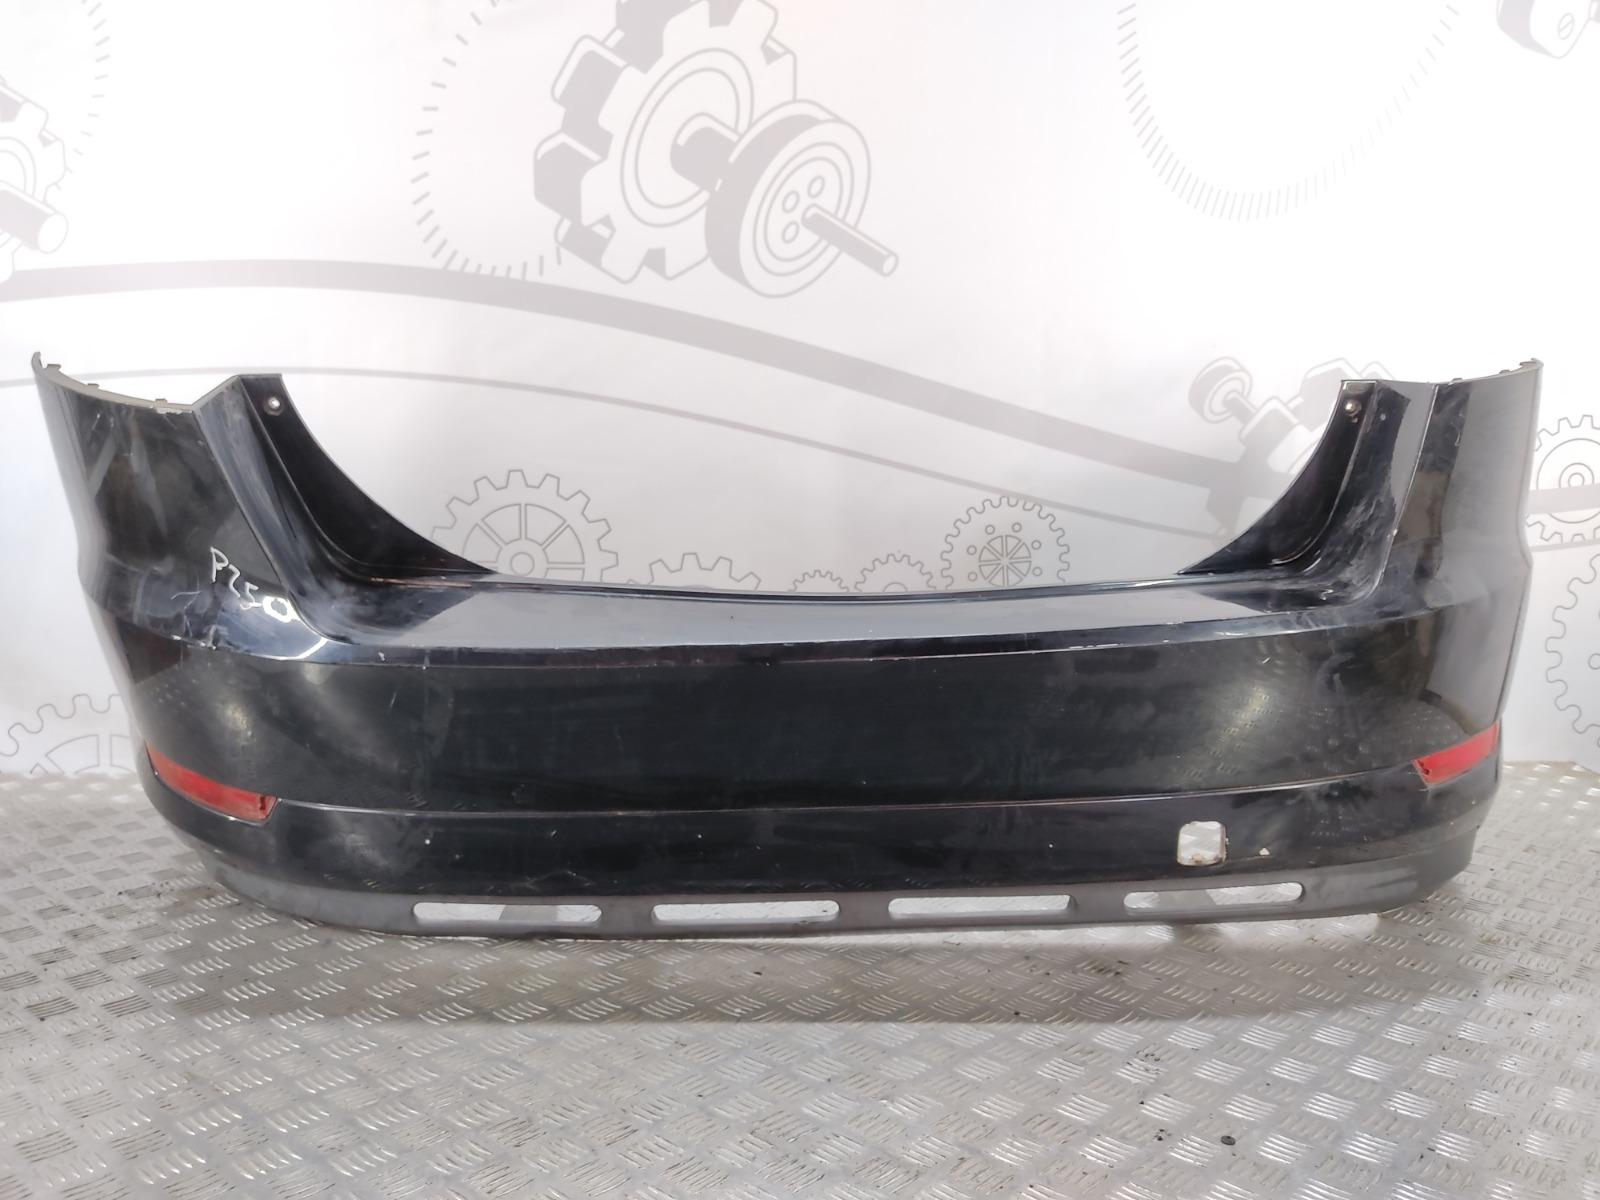 Бампер задний Ford Mondeo 1.8 TDCI 2008 (б/у)